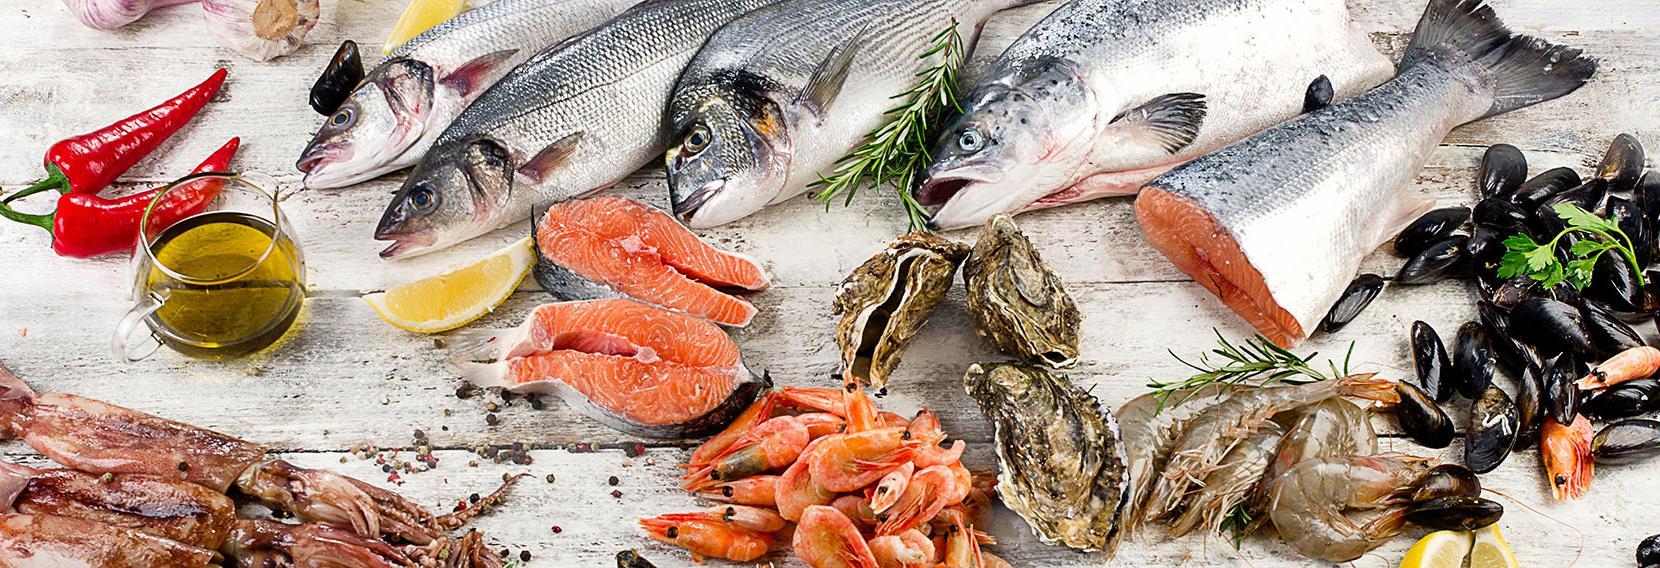 M&M Seafood Market Banner